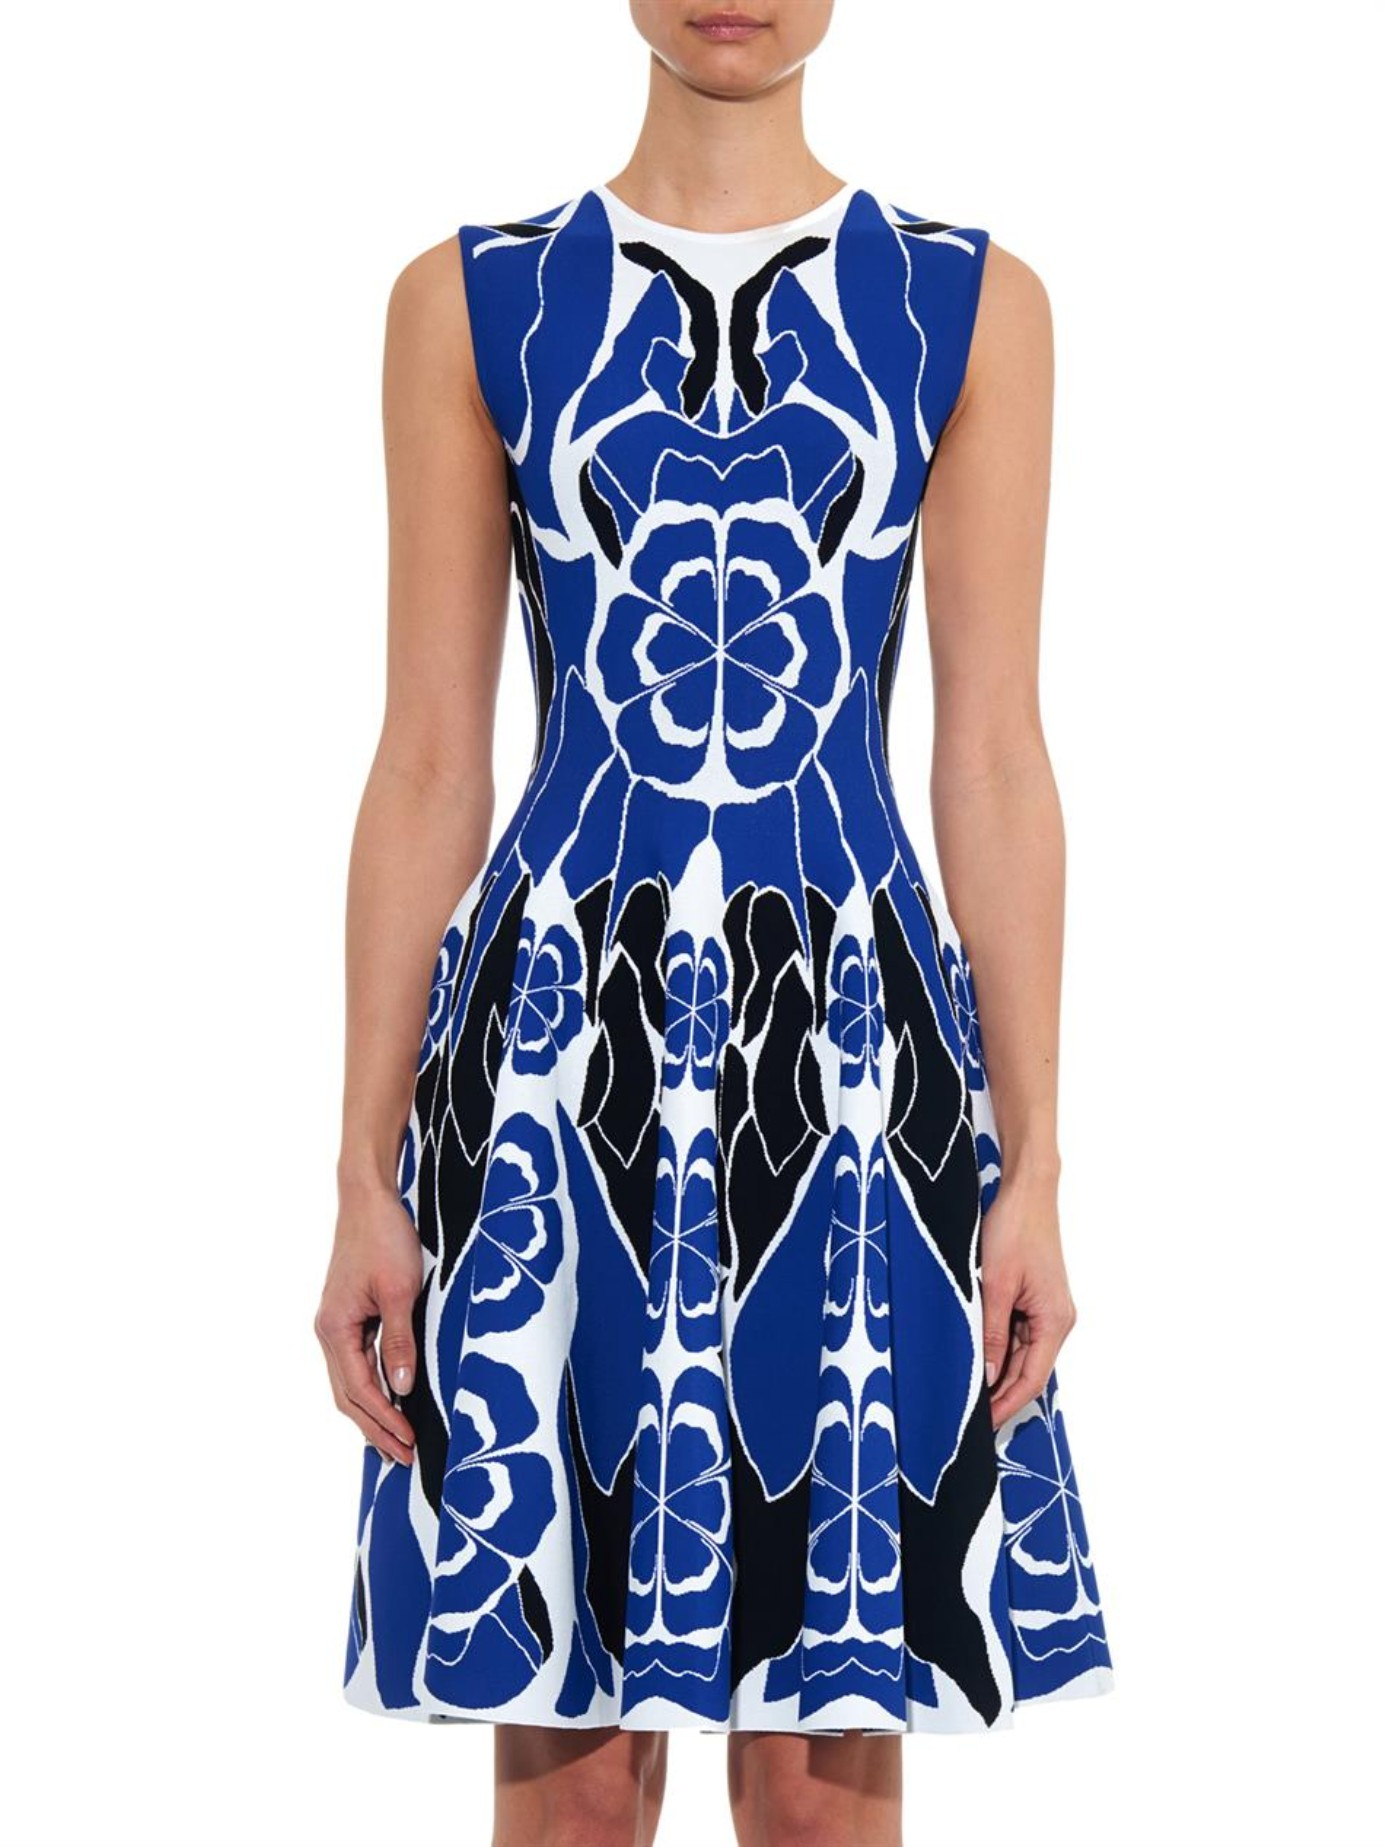 Alexander McQueen Floral-Intarsia Stretch-Knit Dress in Blue ...